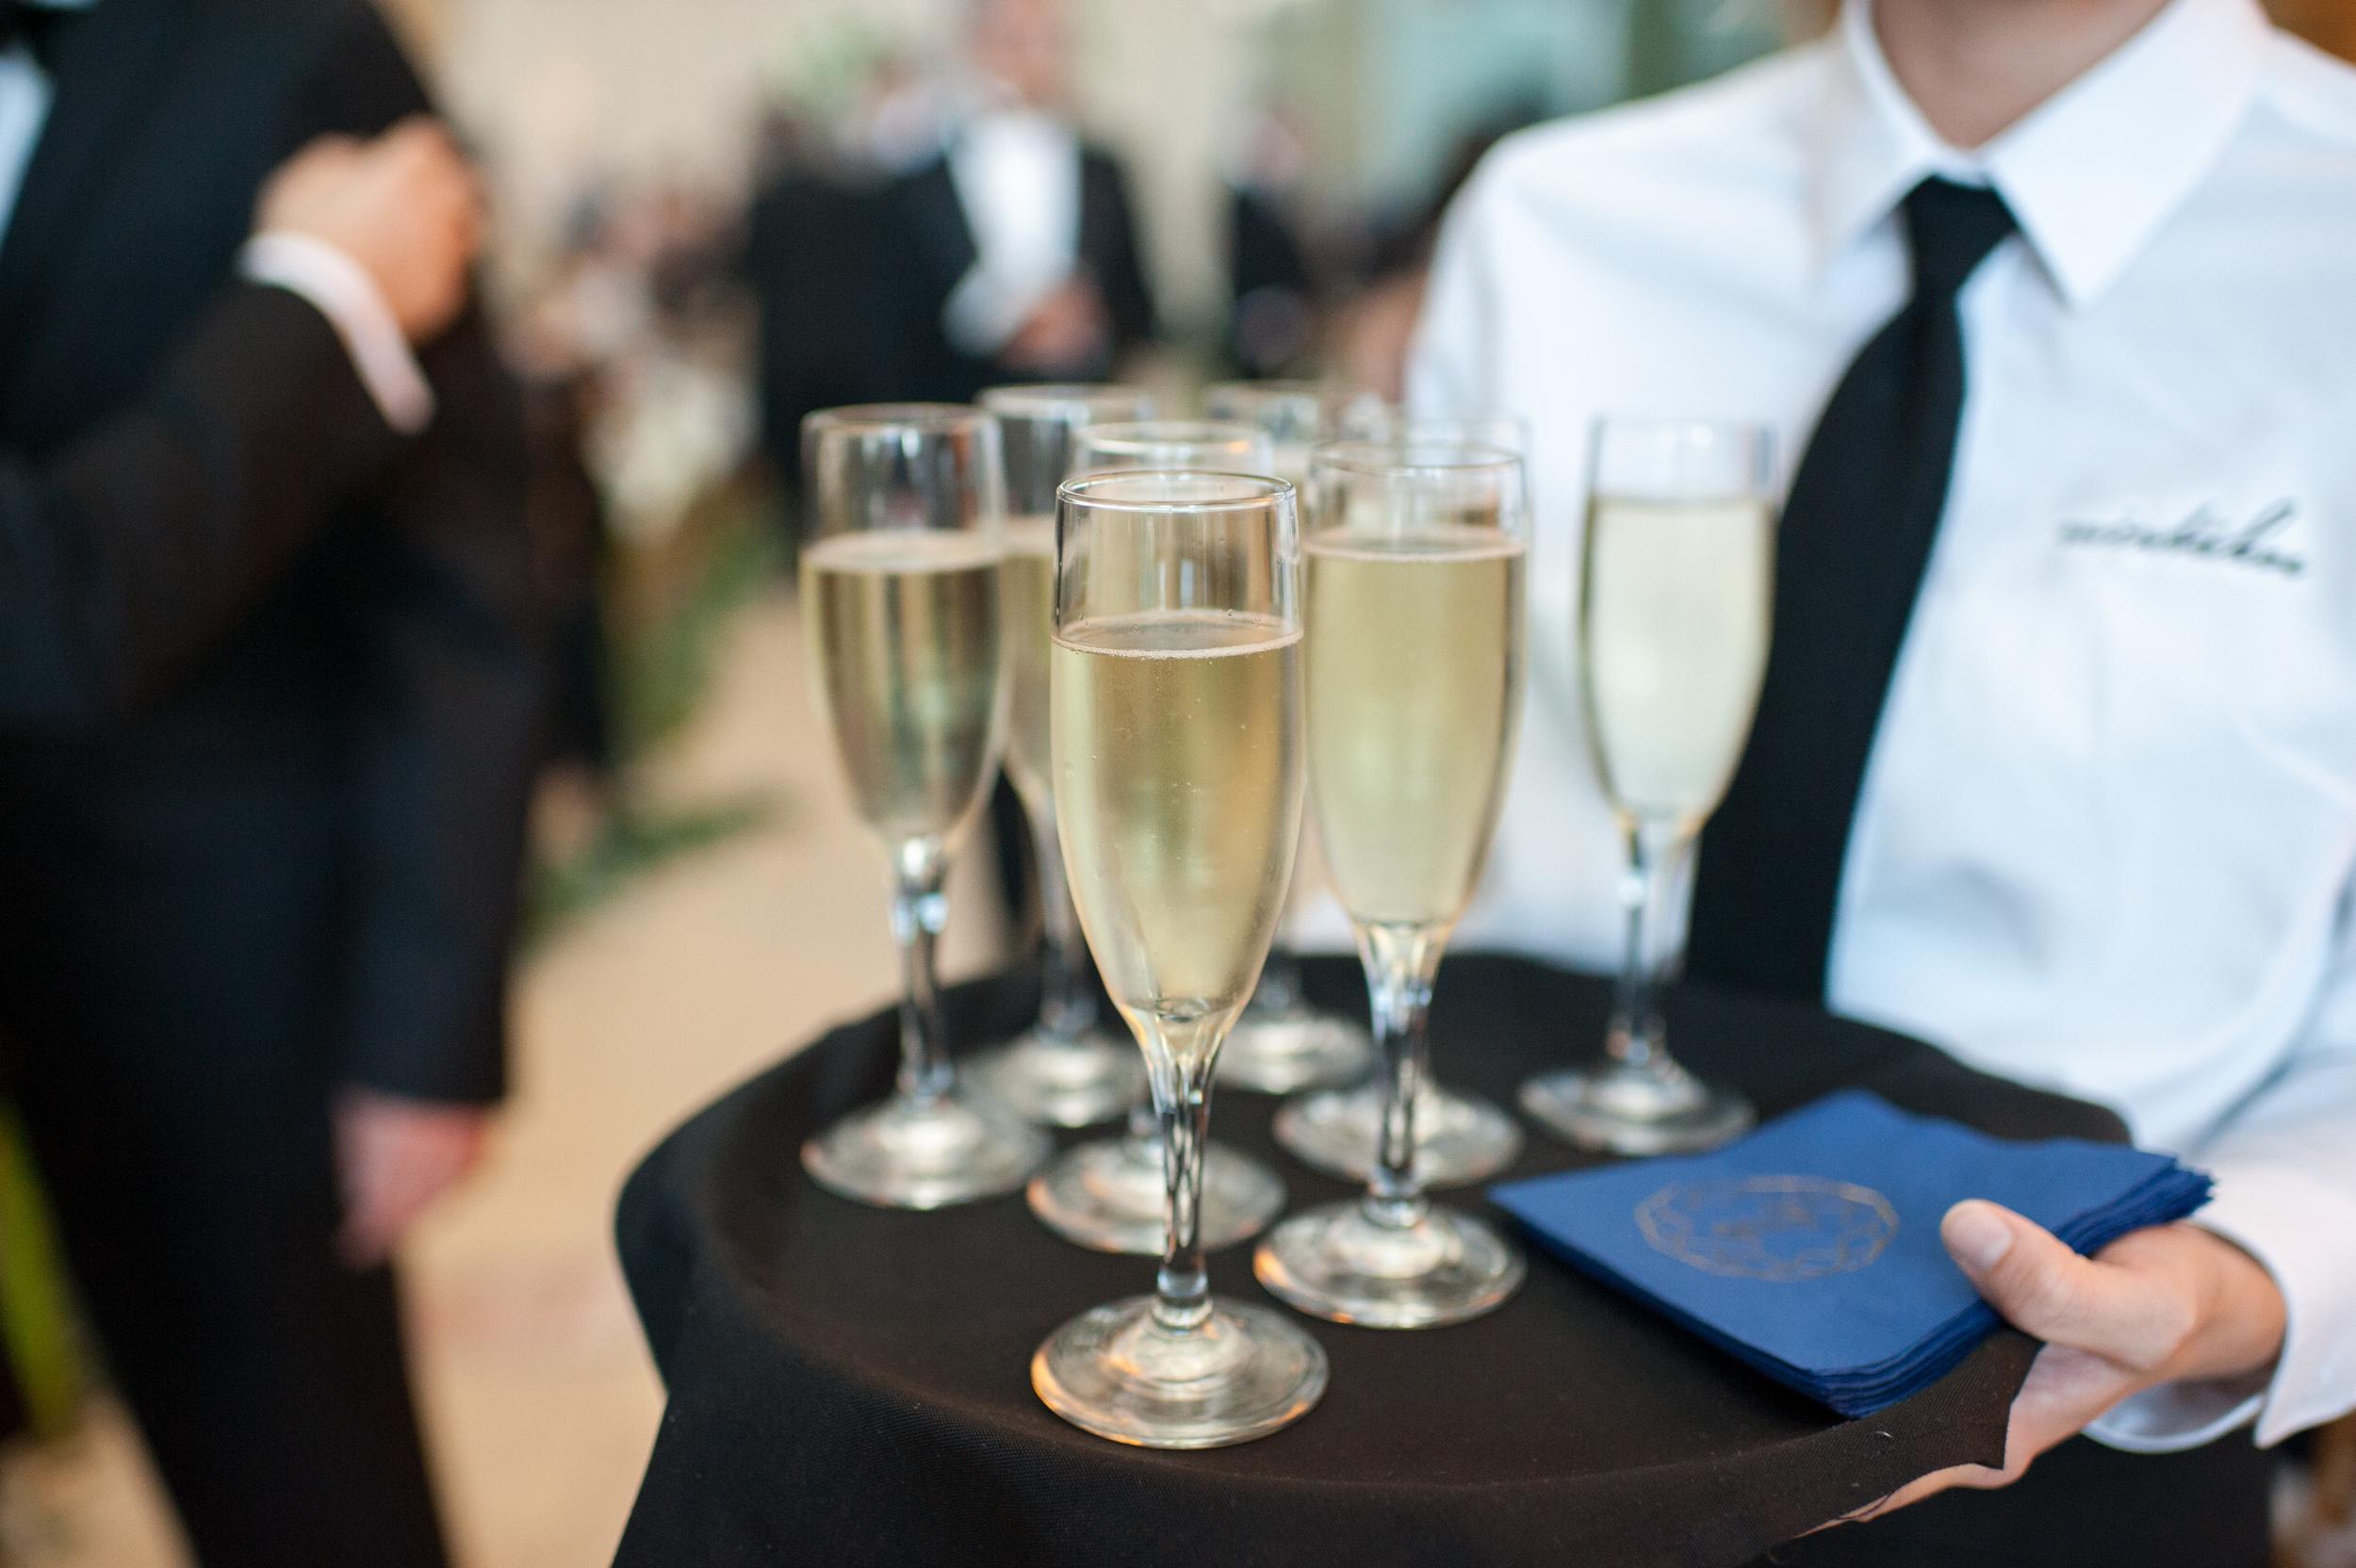 Acowsay_Cinema_MN_Wedding_Champagne.jpg